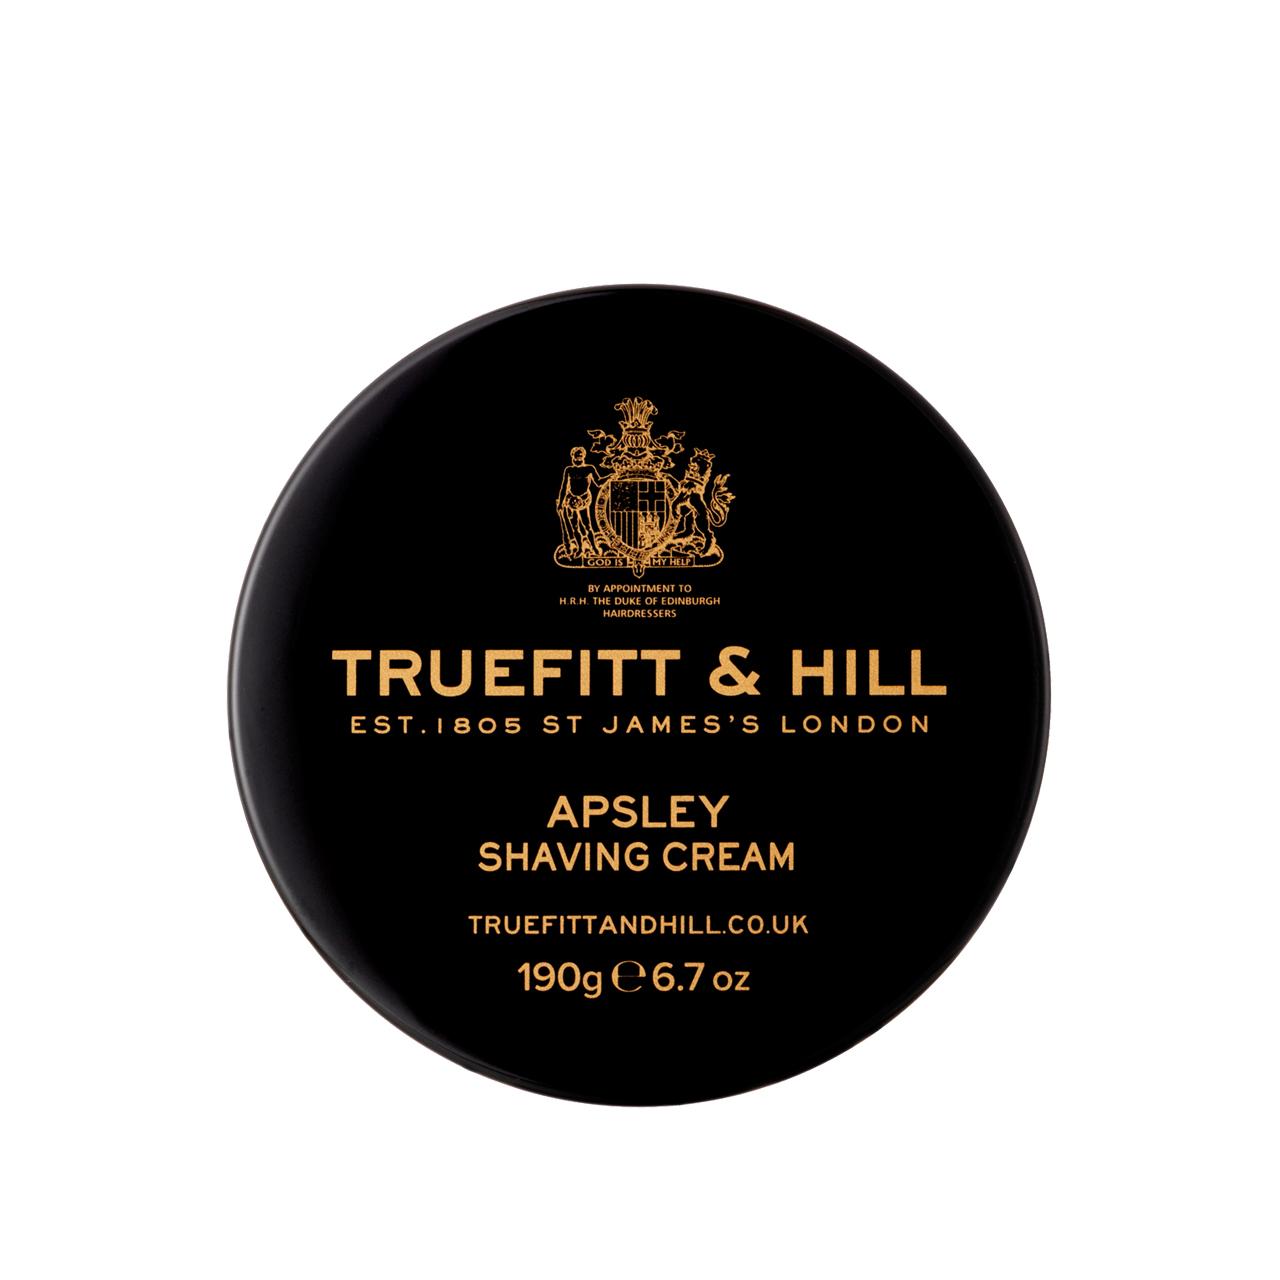 Apsley - Shaving Cream Bowl